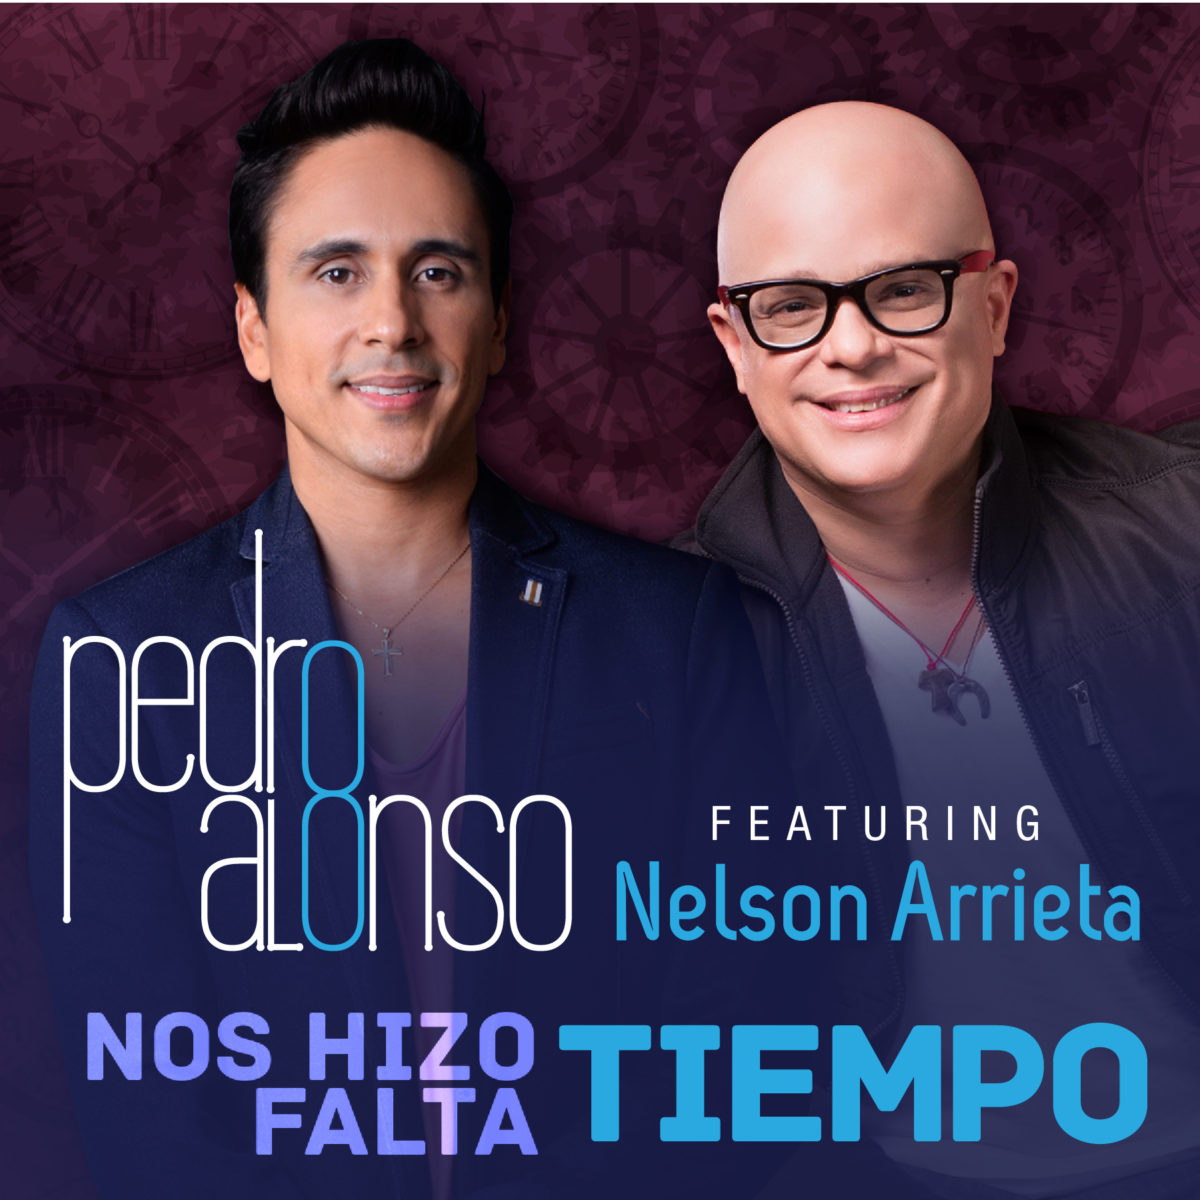 Pedro Alonso Nos Hizo Falta Tiempo